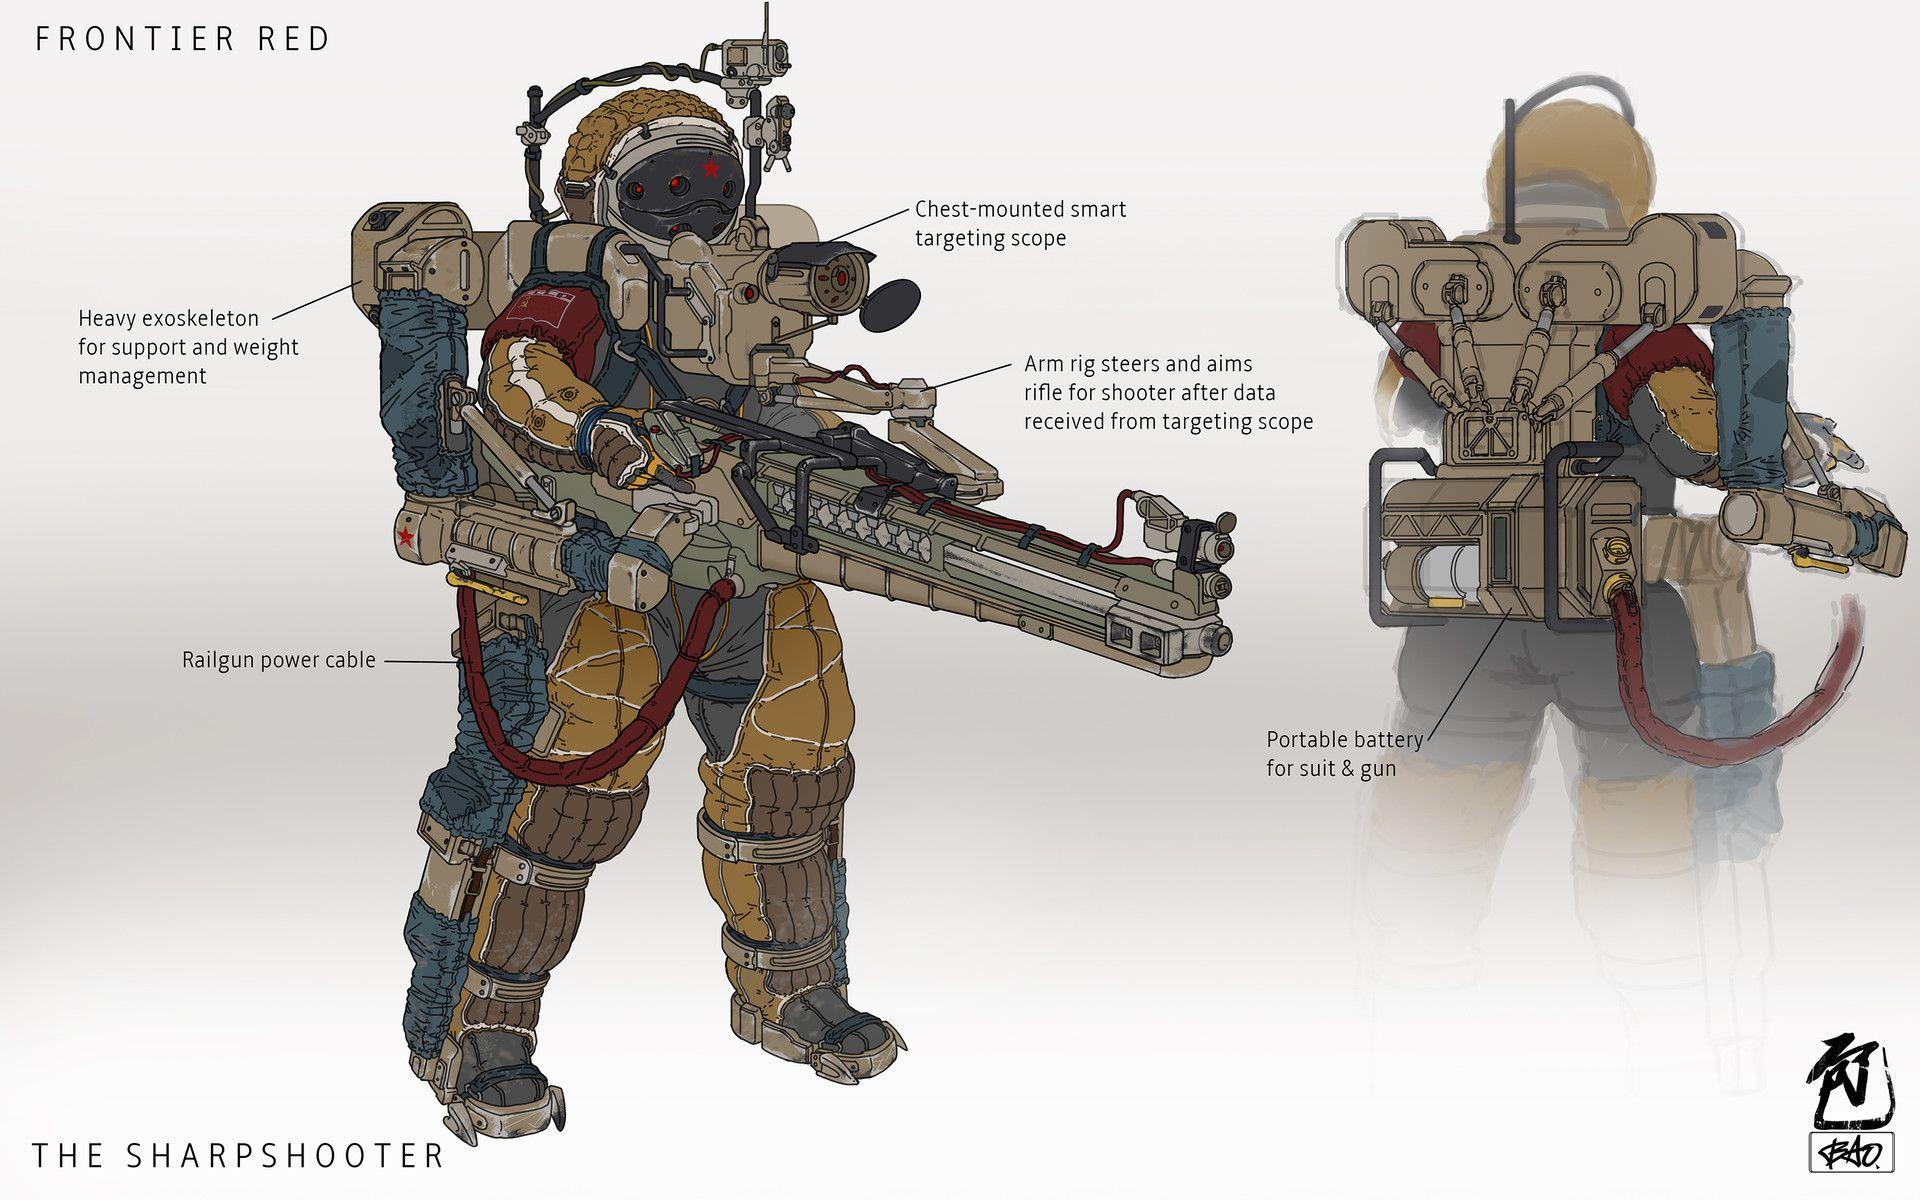 ArtStation - Frontier Red: Major Kova, William Bao